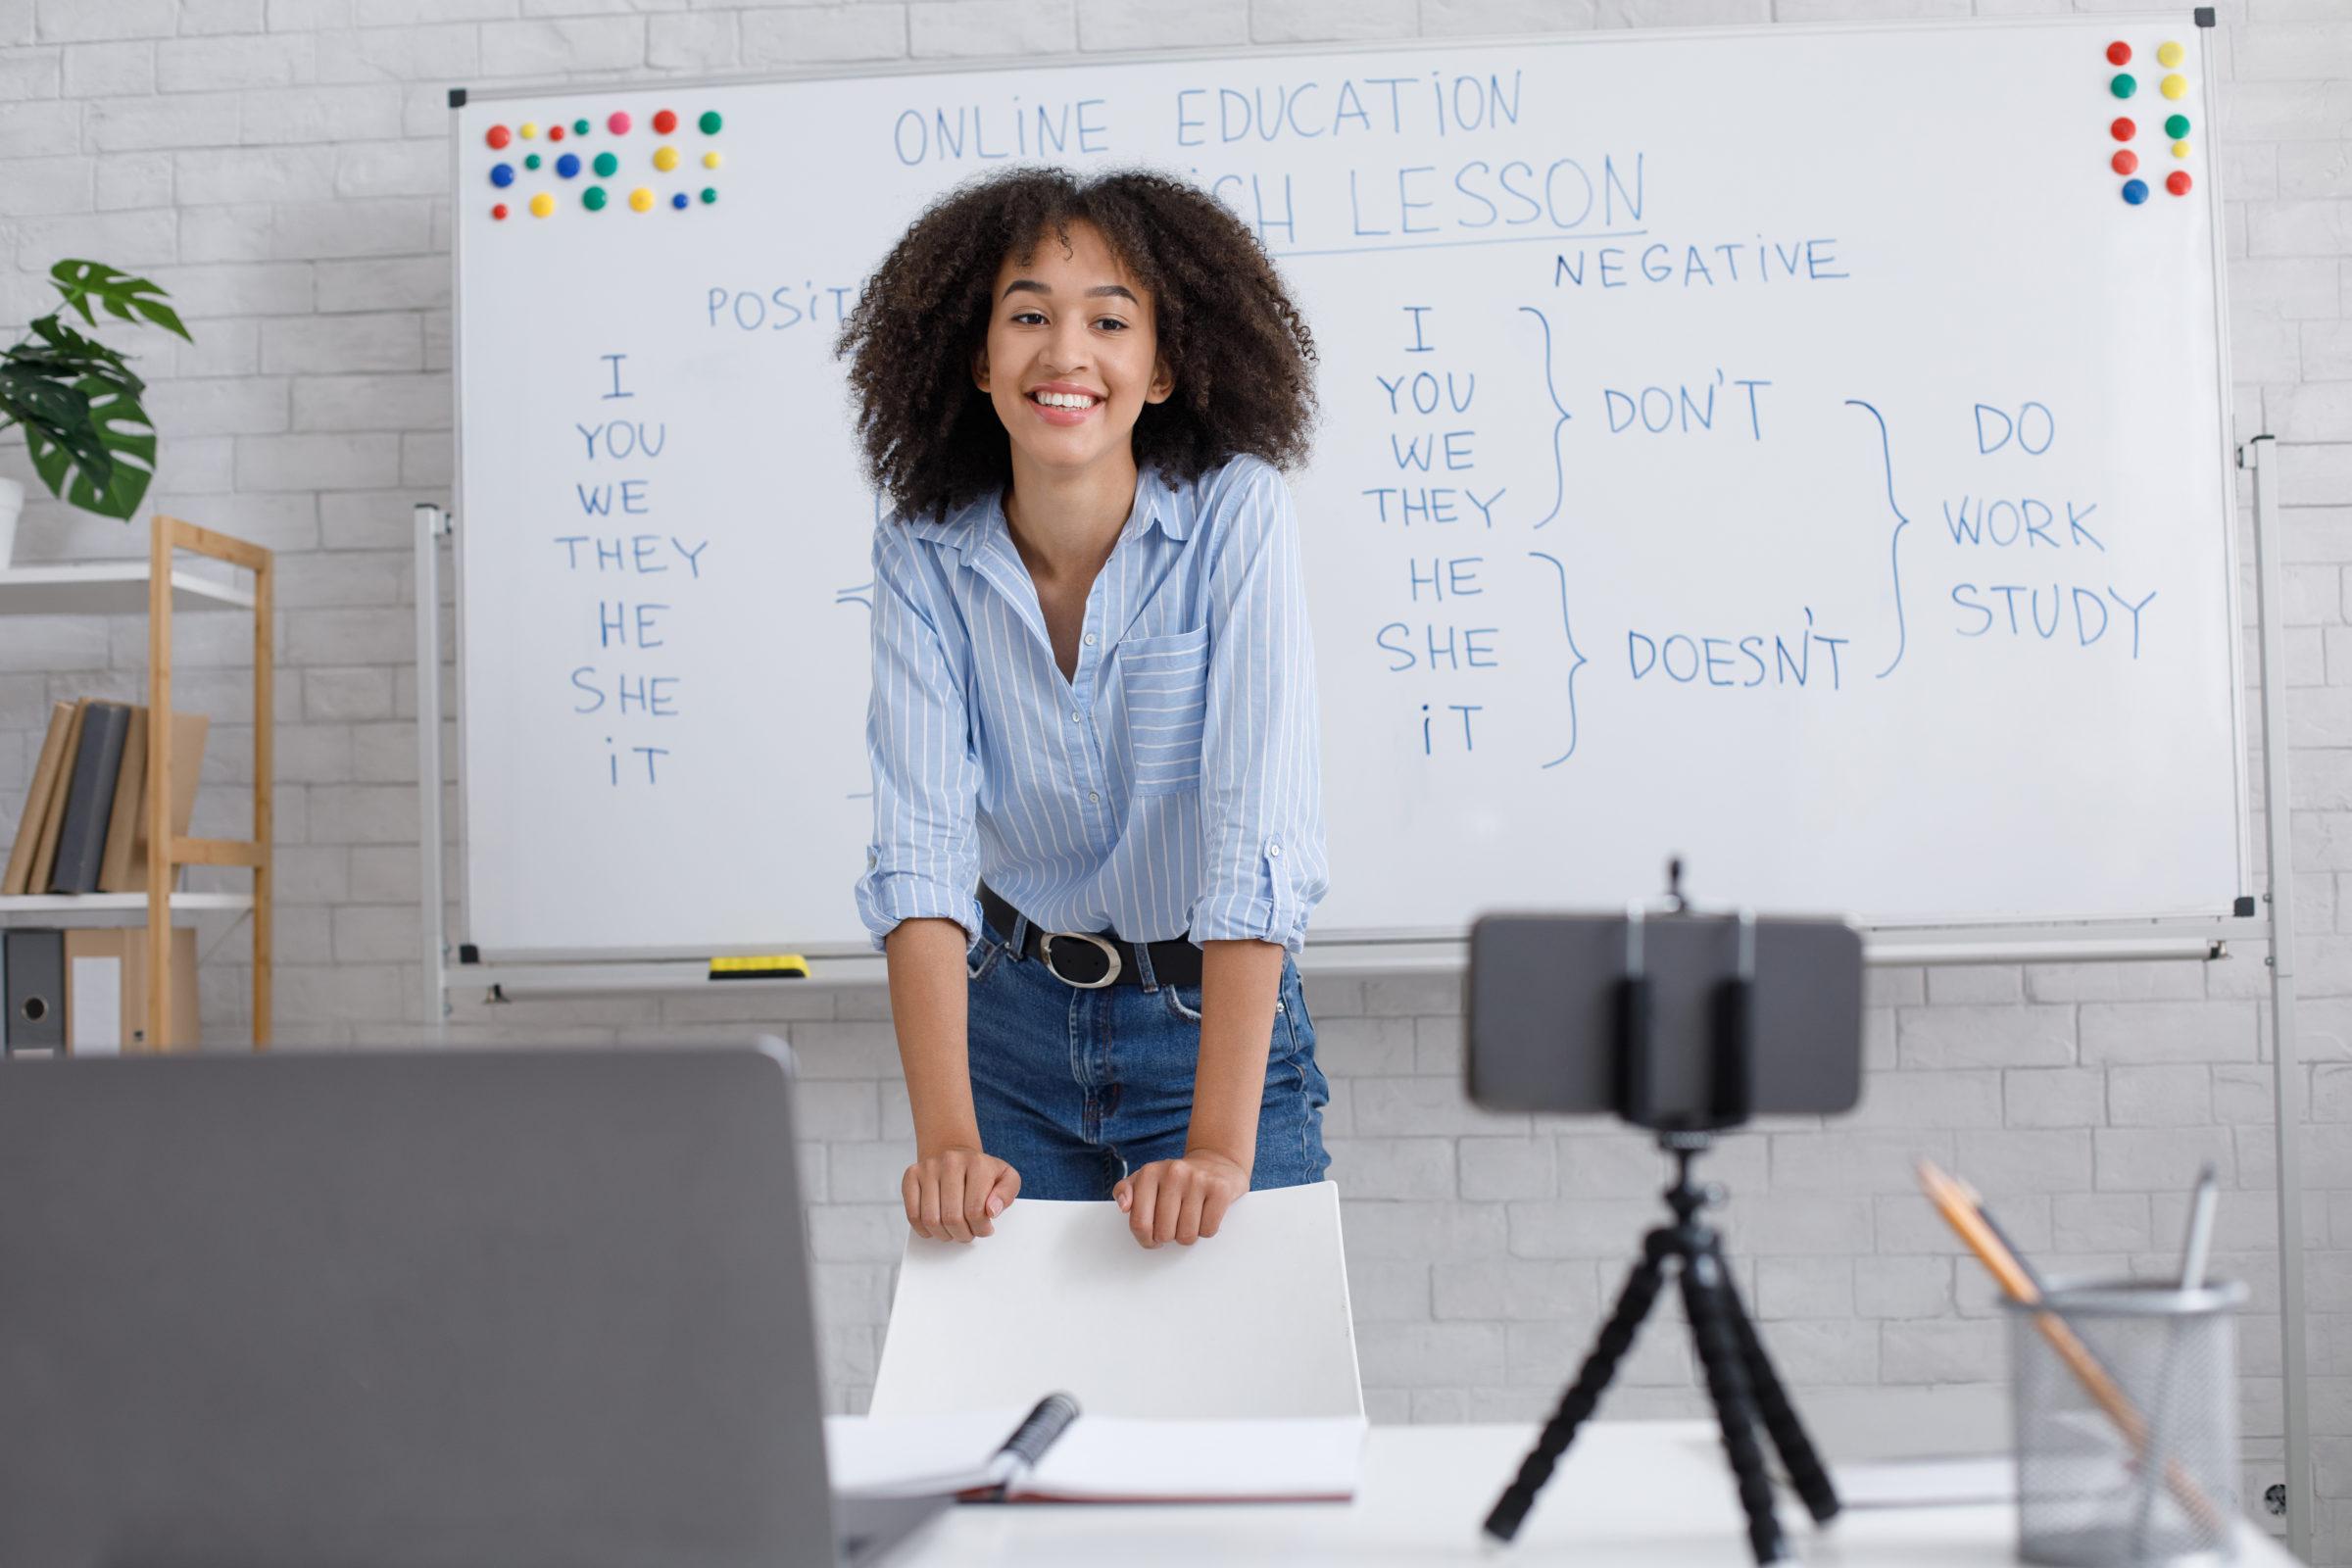 questions to english teacher online african americ U7DM5AM